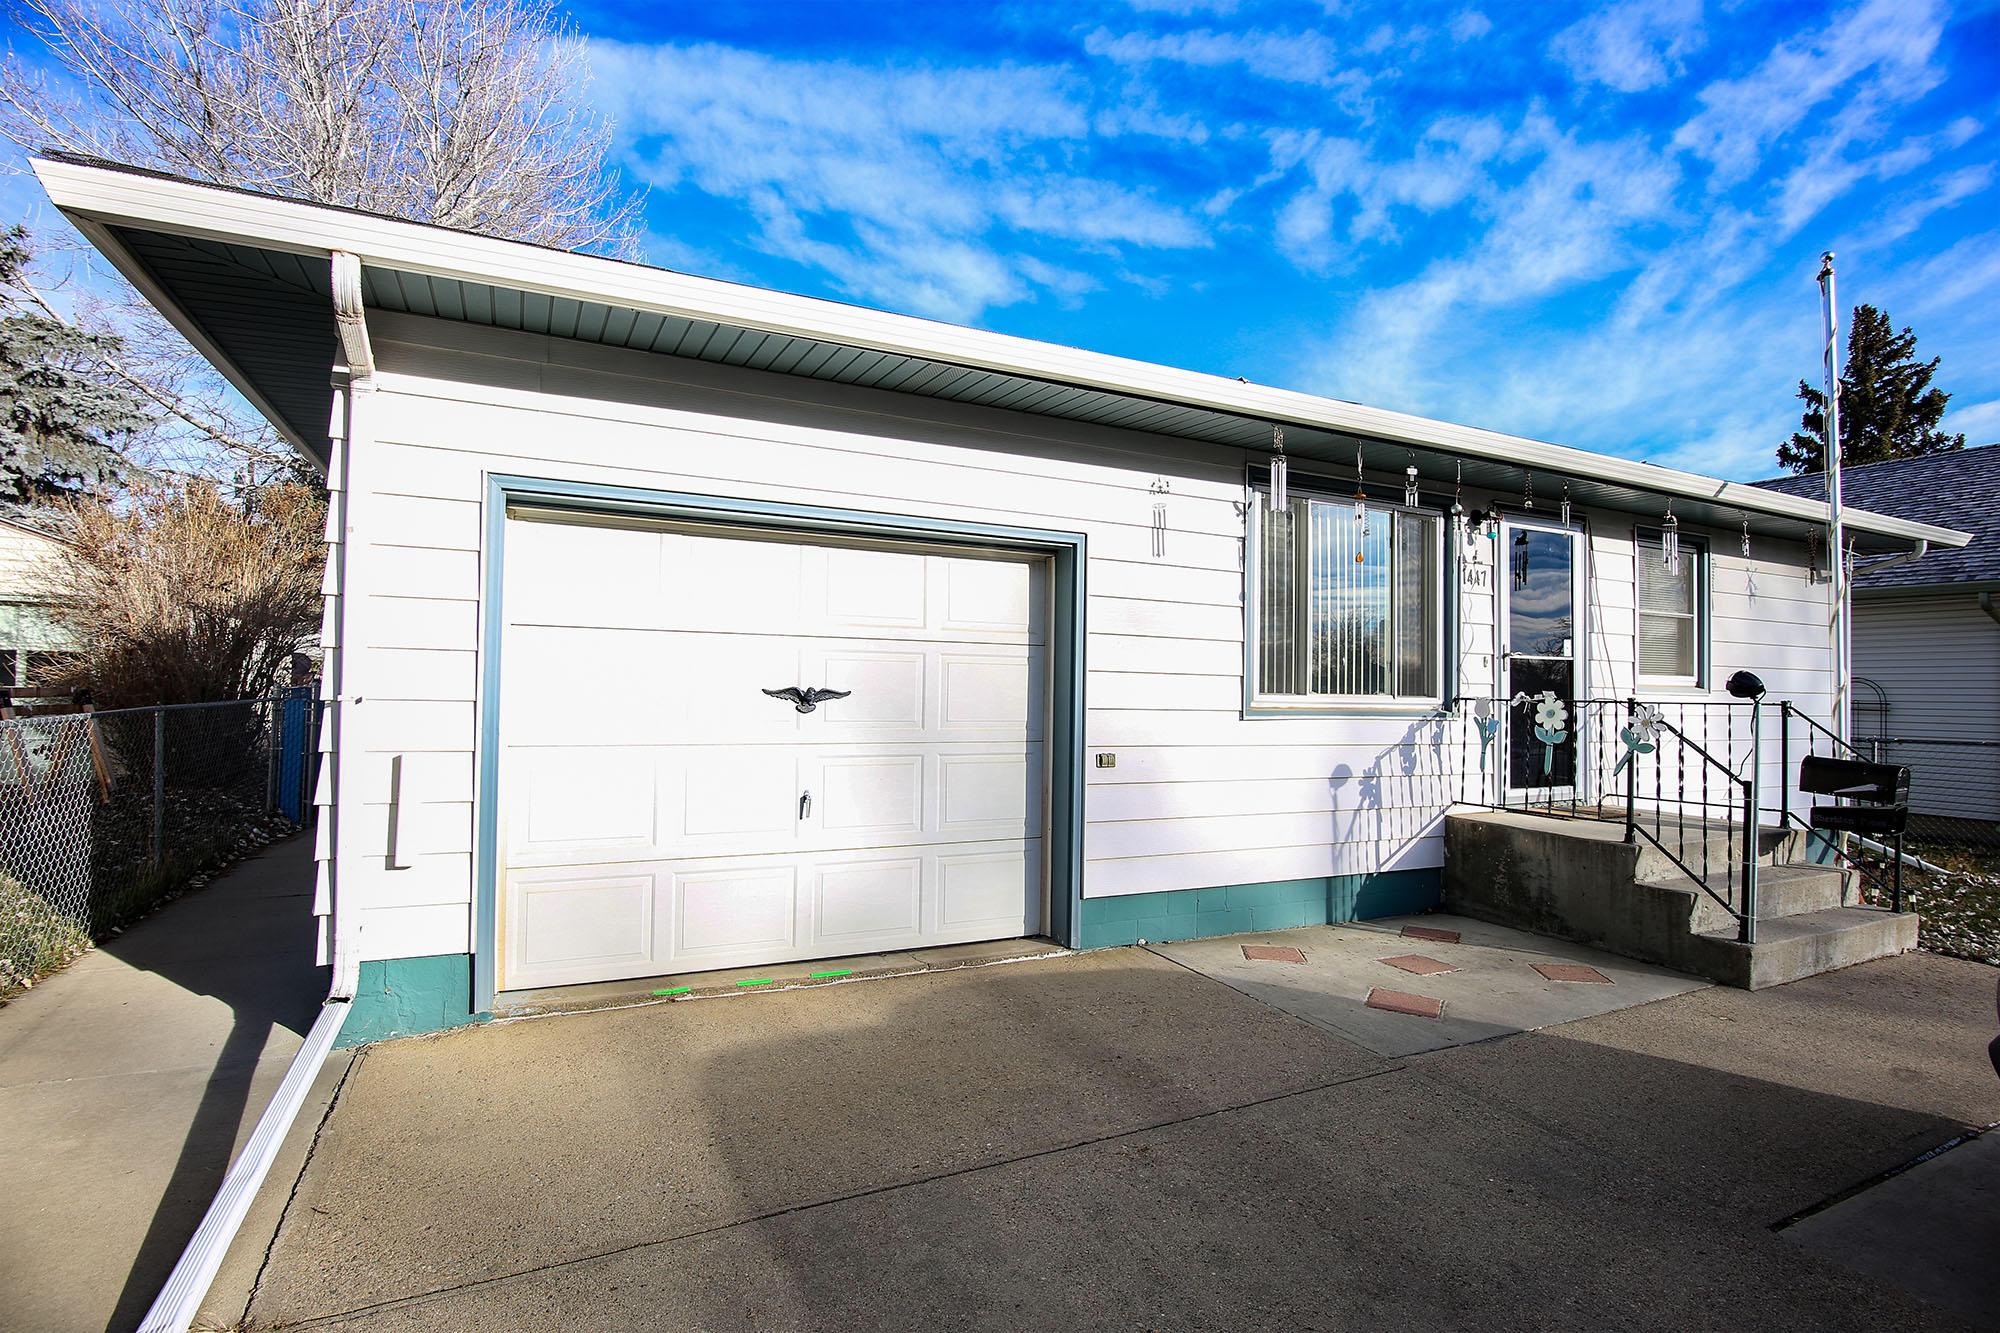 1447 Victoria Street, Sheridan, Wyoming 82801, 2 Bedrooms Bedrooms, ,2 BathroomsBathrooms,Residential,For Sale,Victoria,18-1245